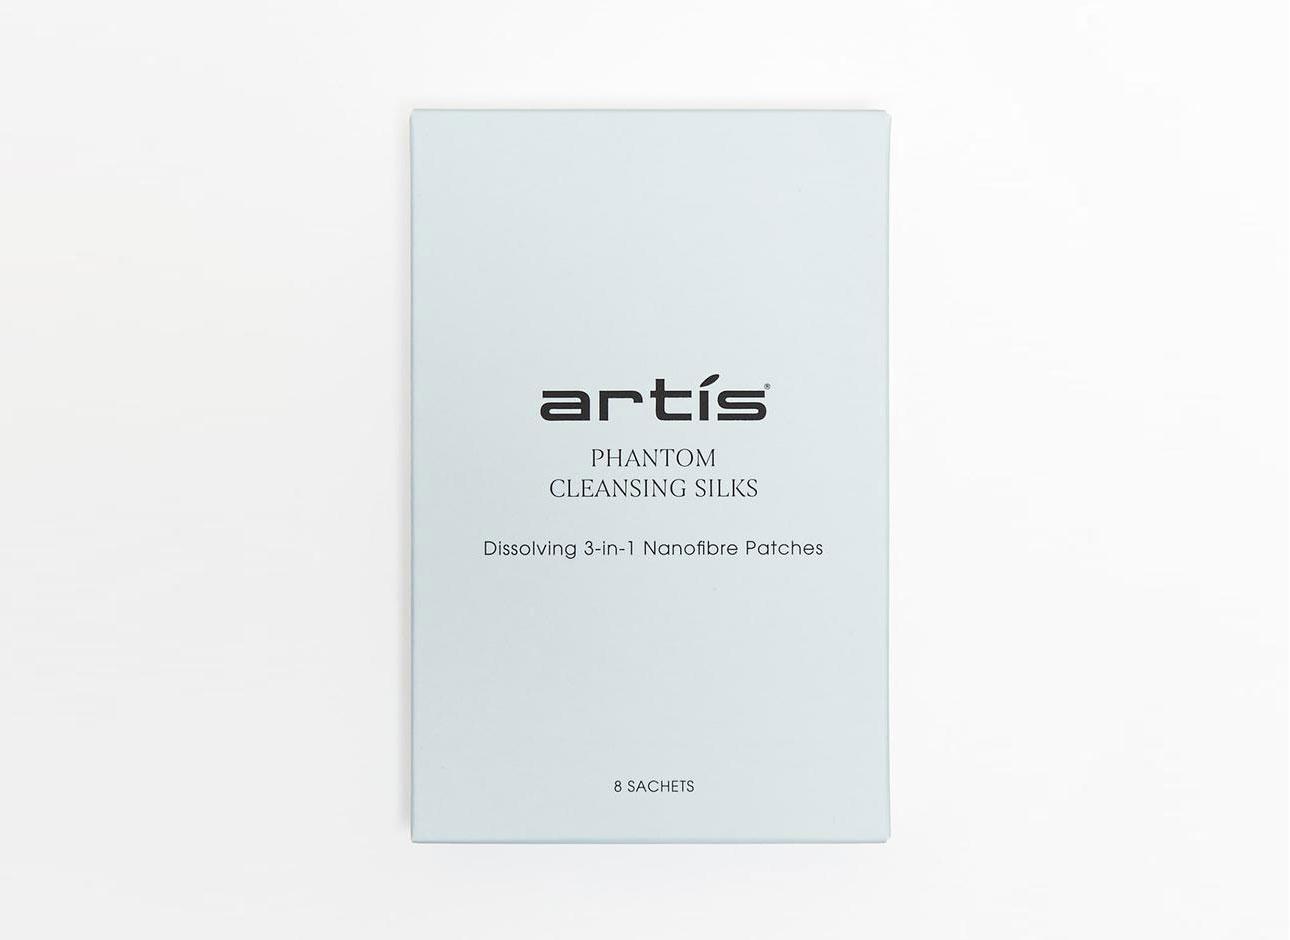 Artis Phantom Cleansing Silks